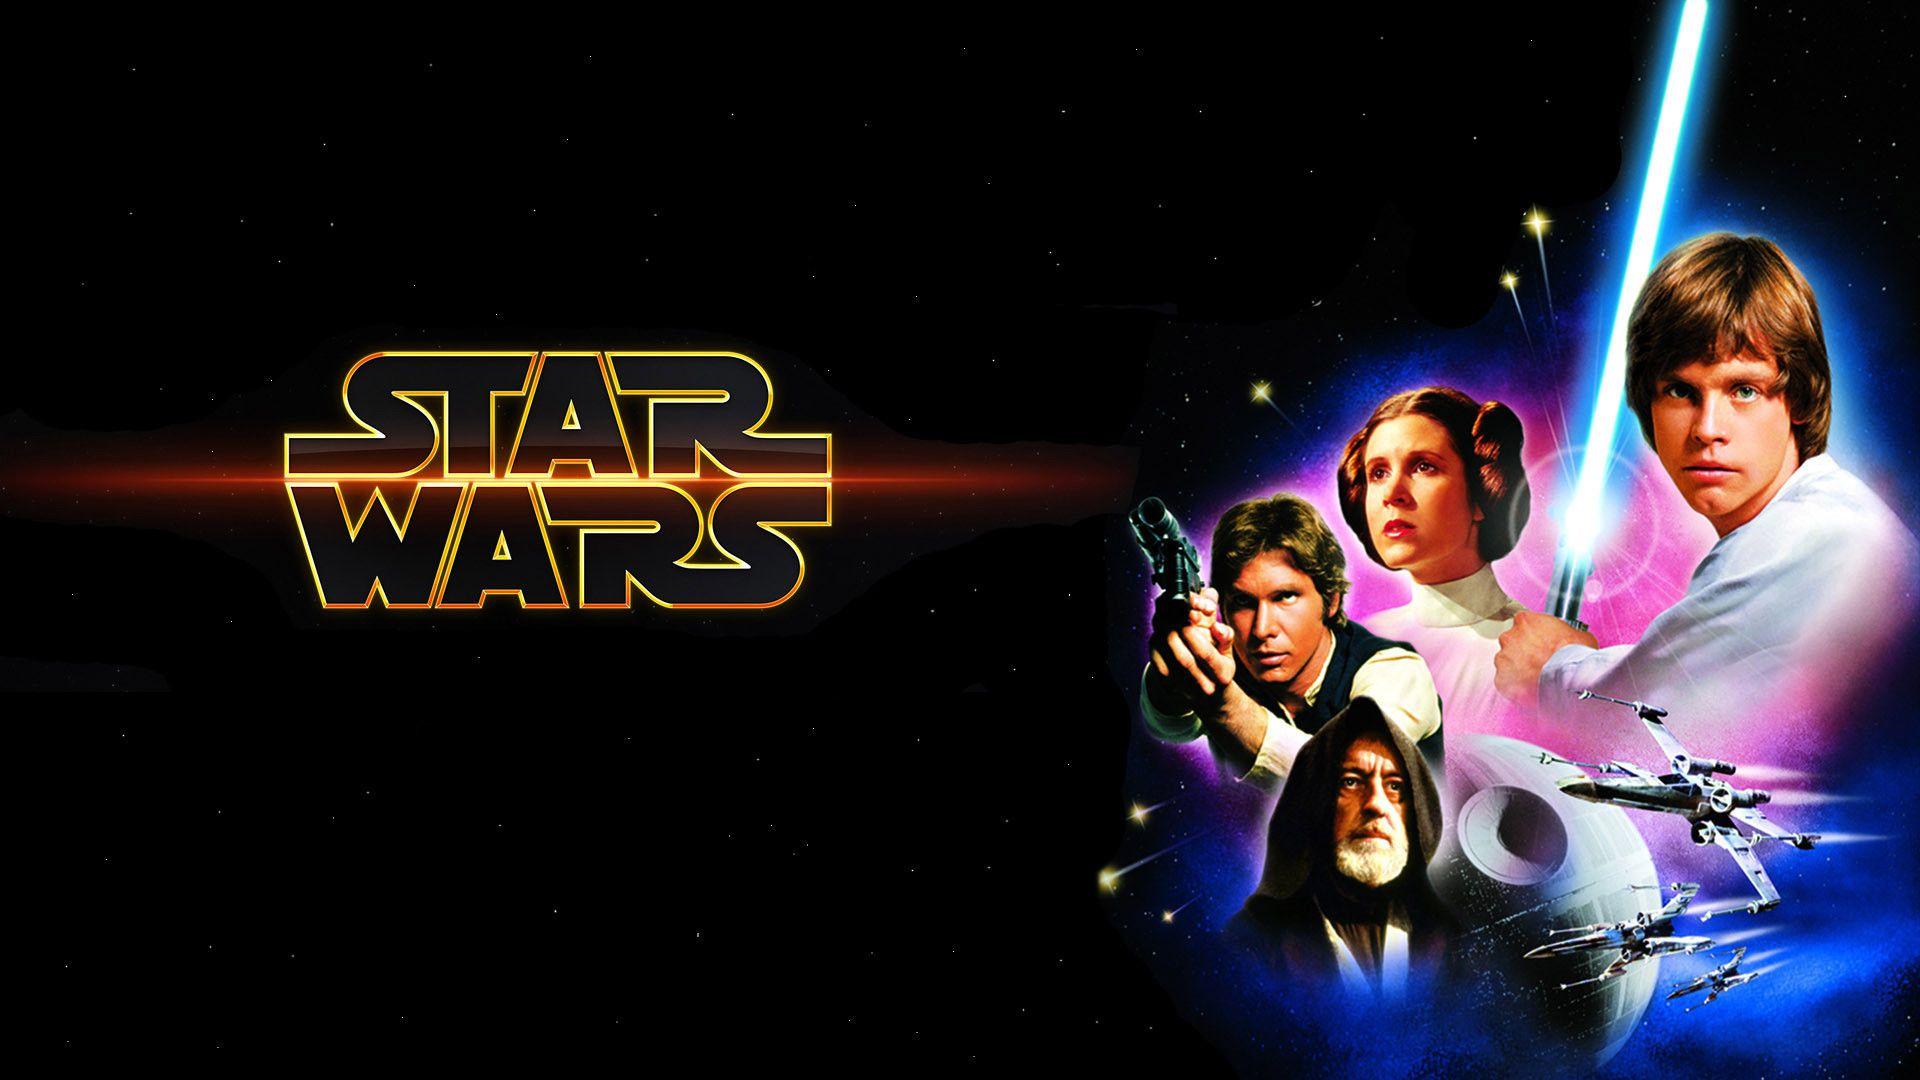 Star wars story sex pics nude movies